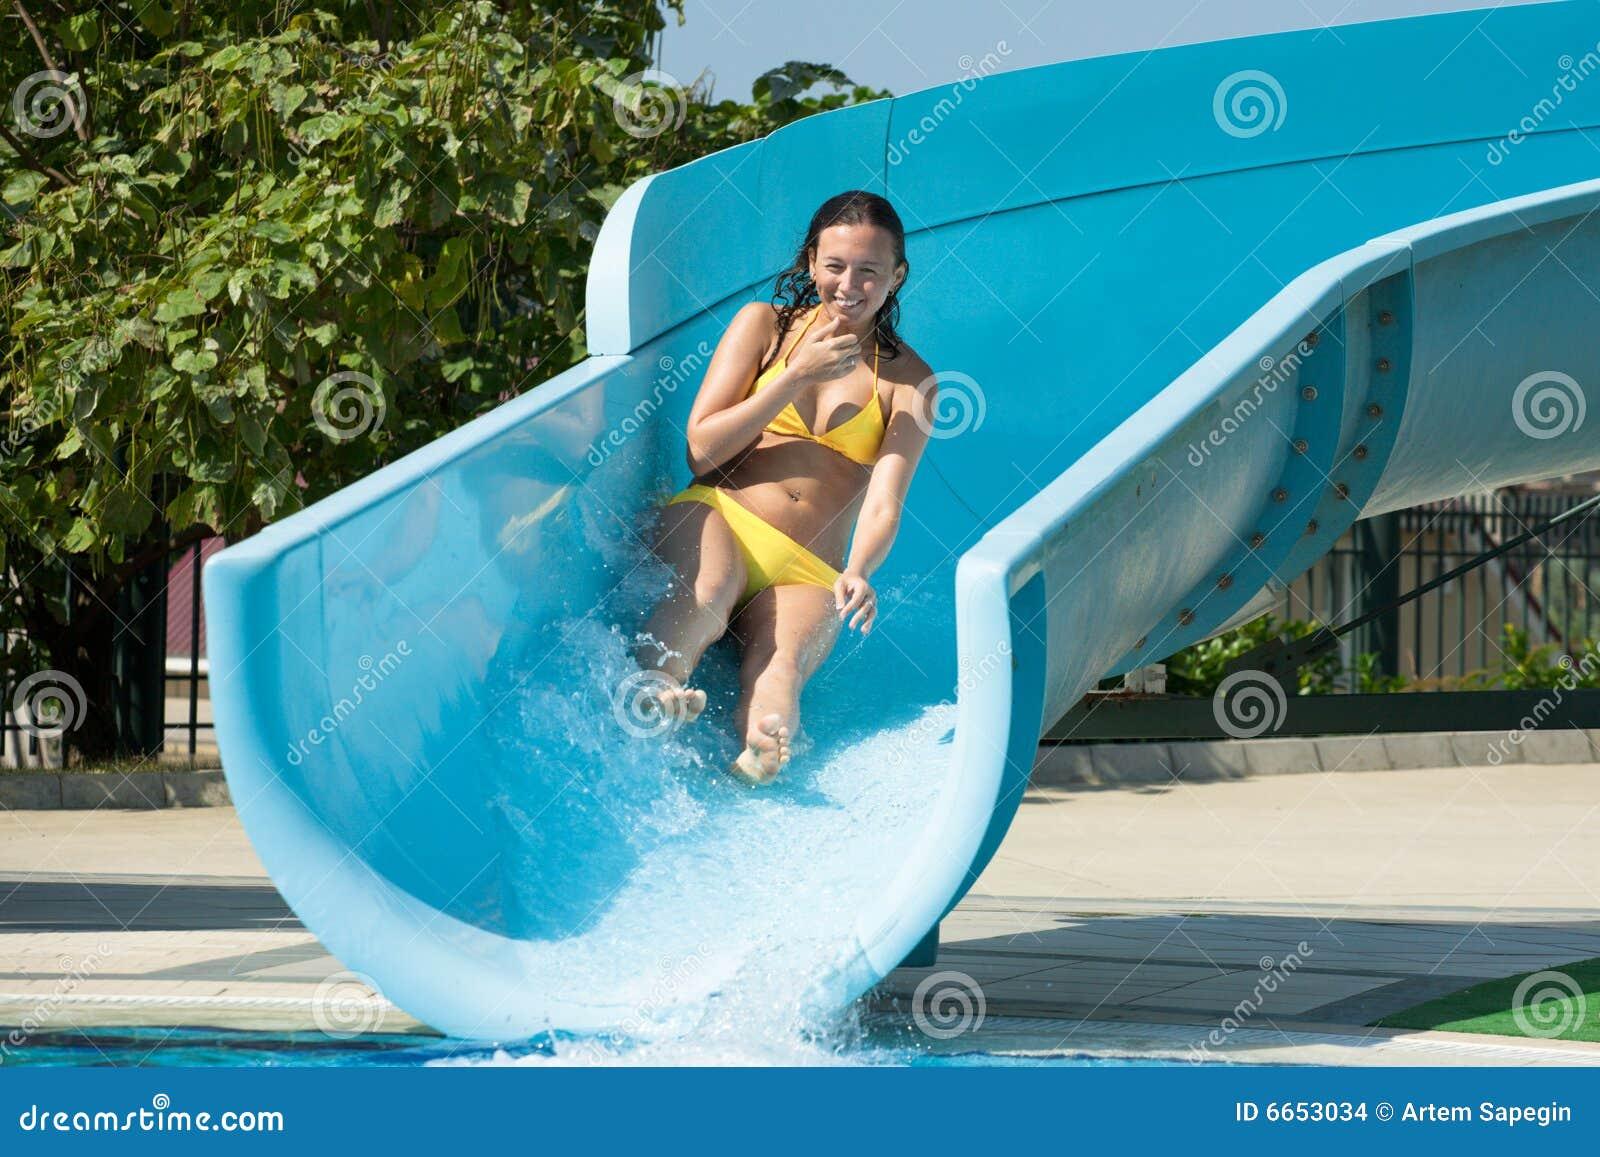 Amazing Woman On Water Slide 1300 x 957 · 192 kB · jpeg